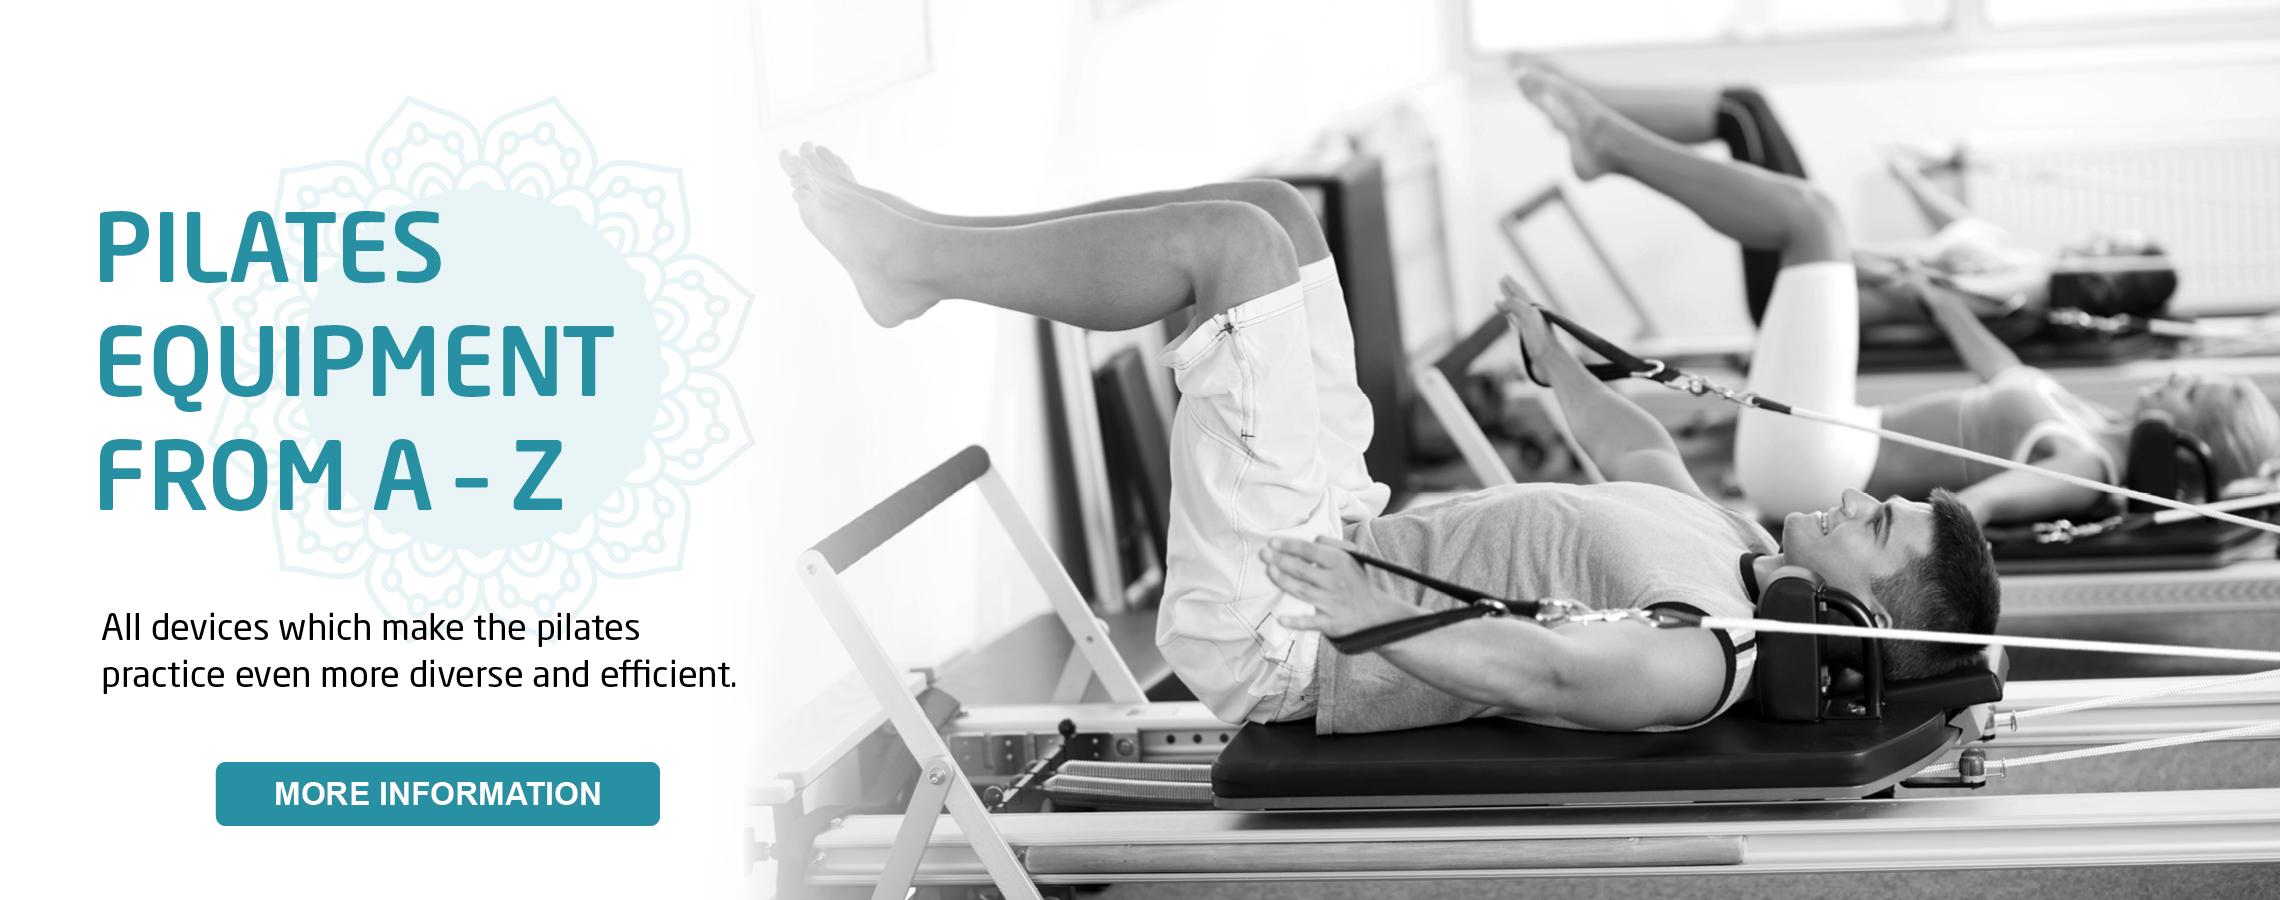 Startpage Teaser Pilates